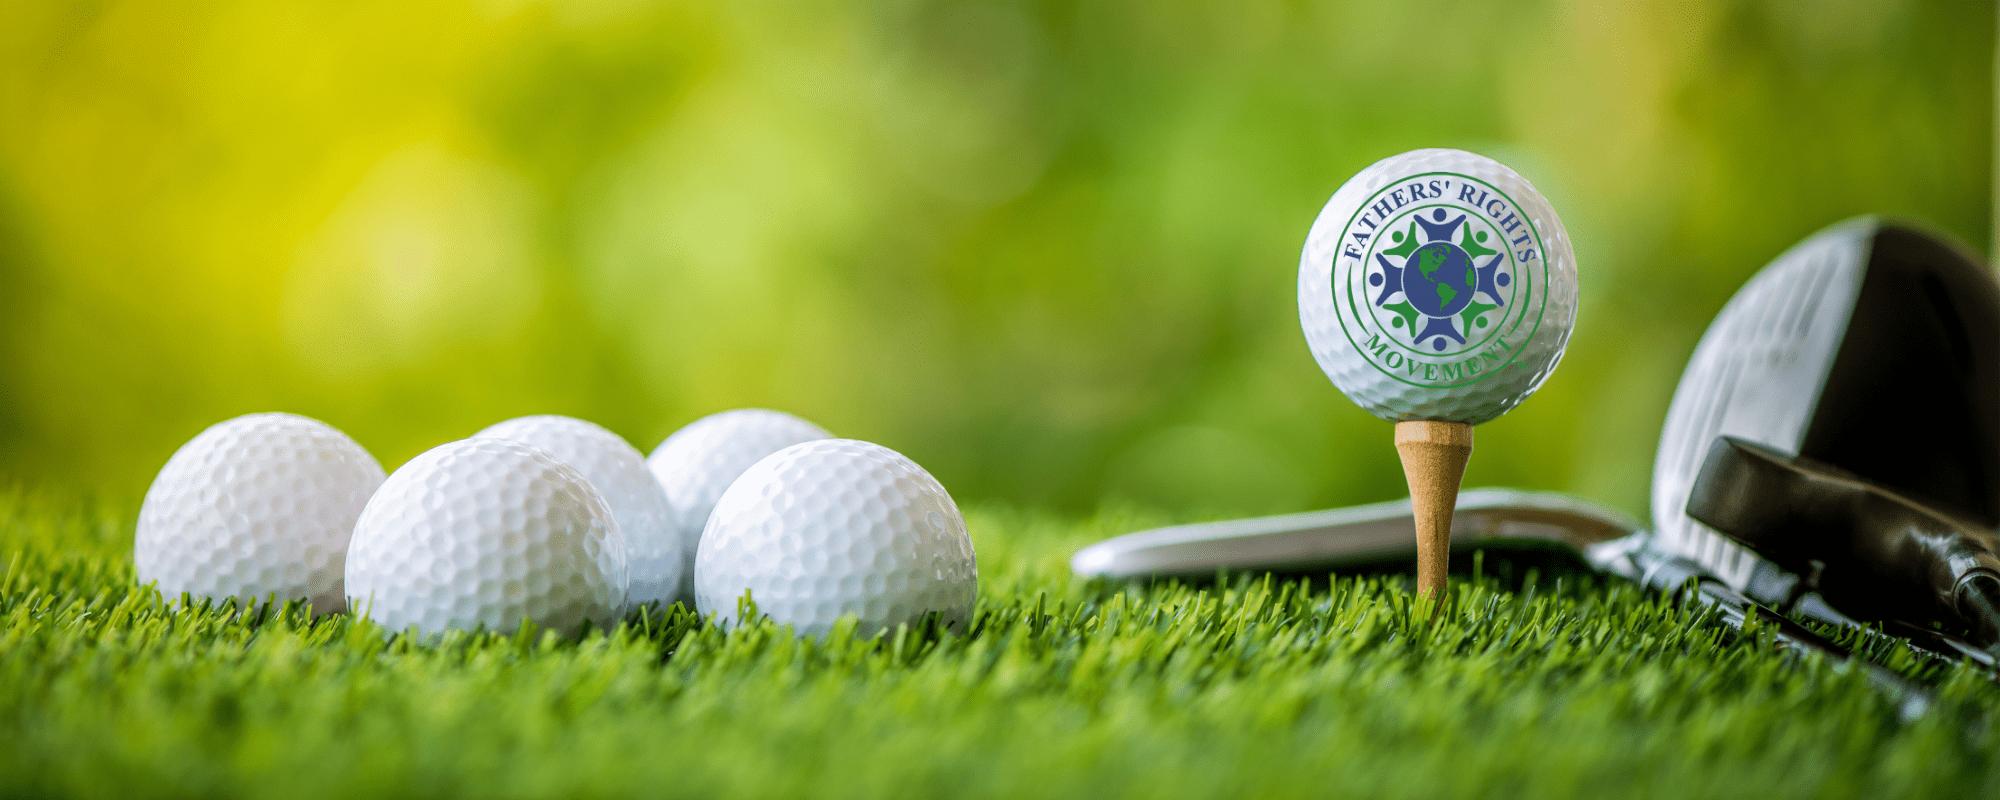 2021 Father's Day Golf Scramble